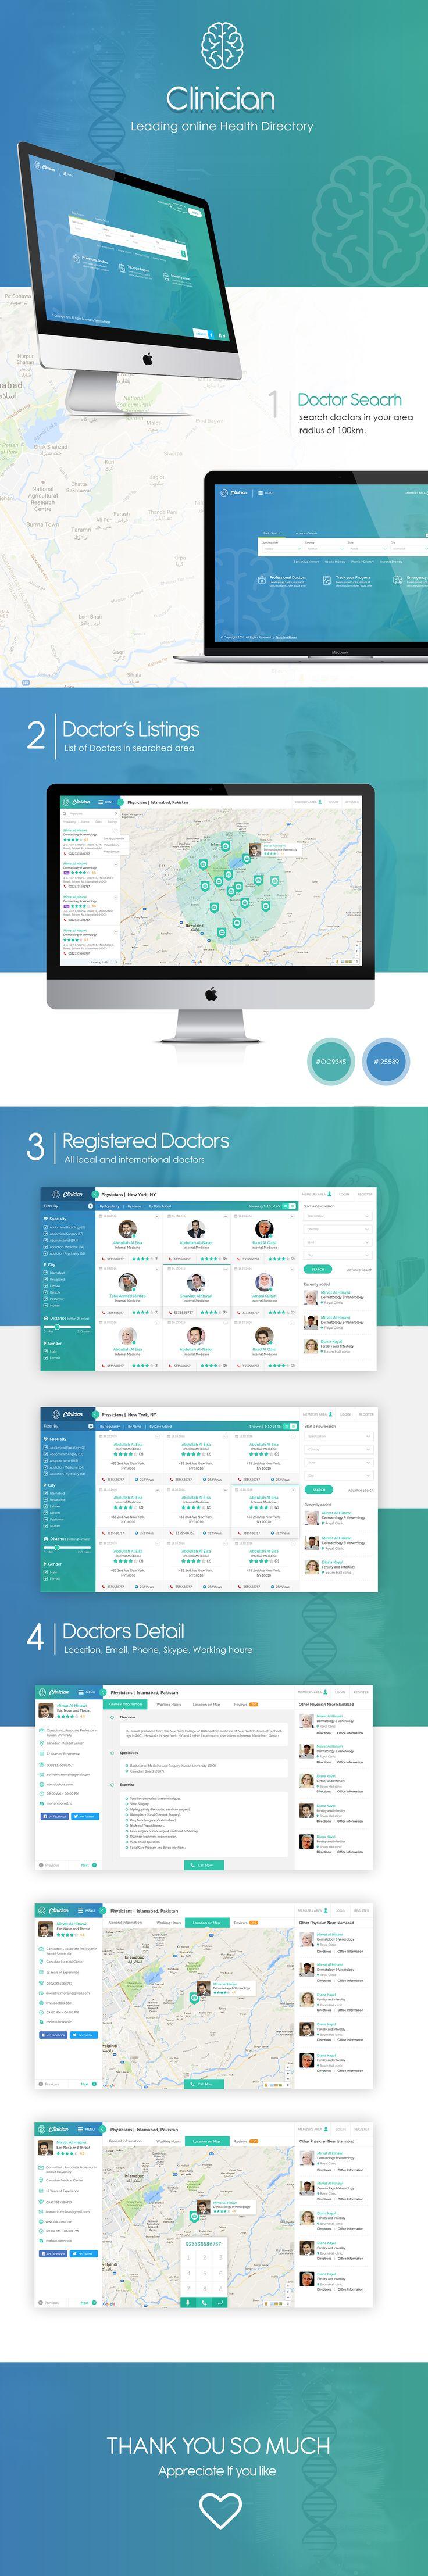 Clinician   Doctors Directory